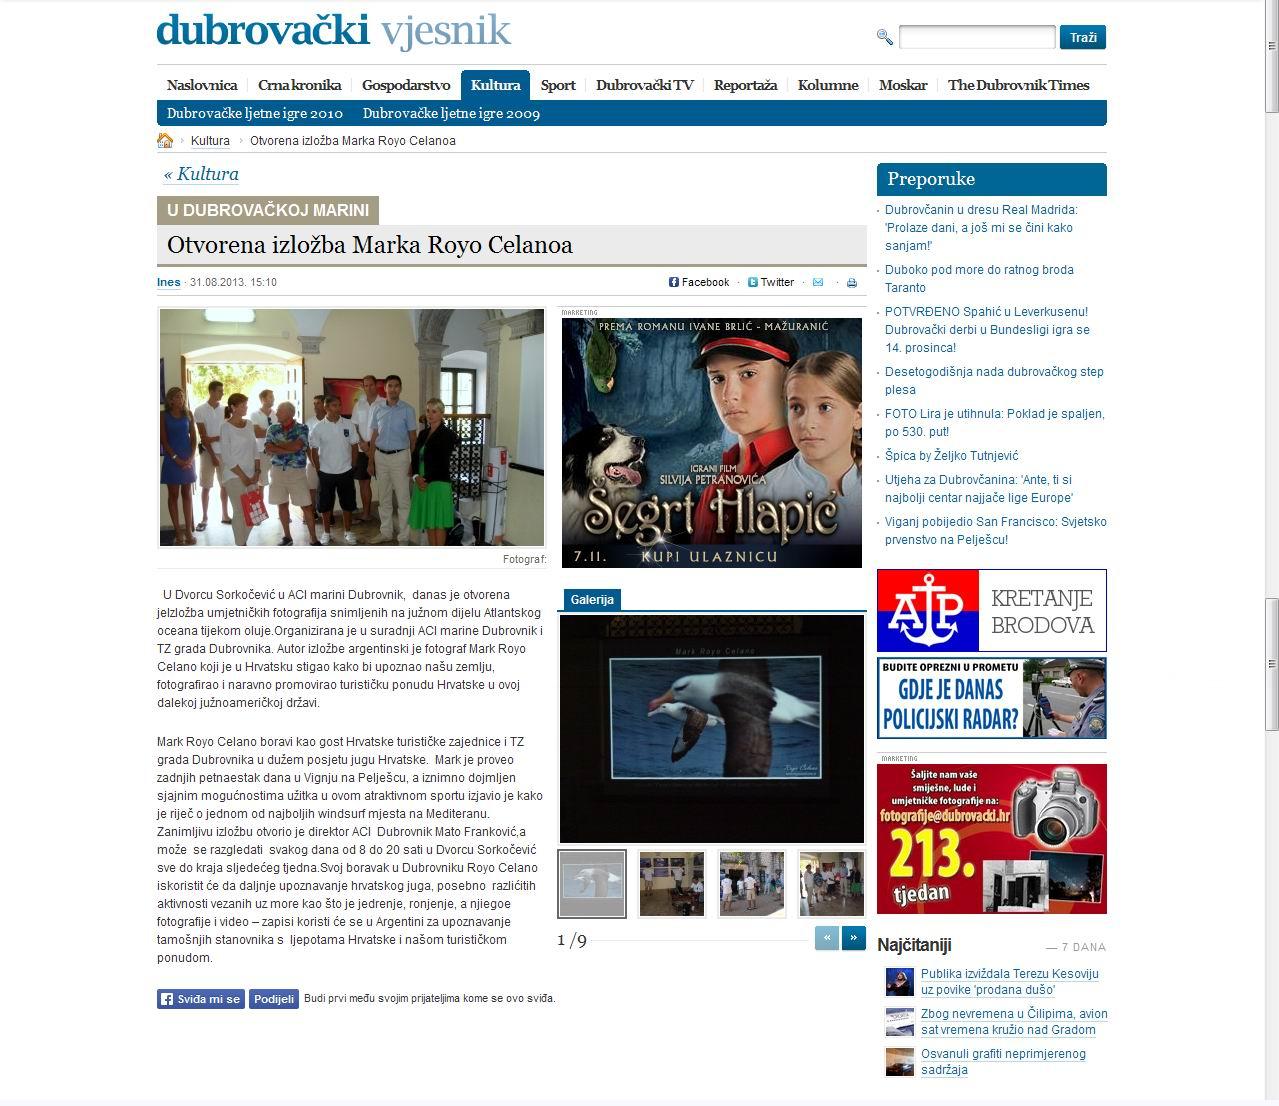 DUBROVNIK NEWS 2